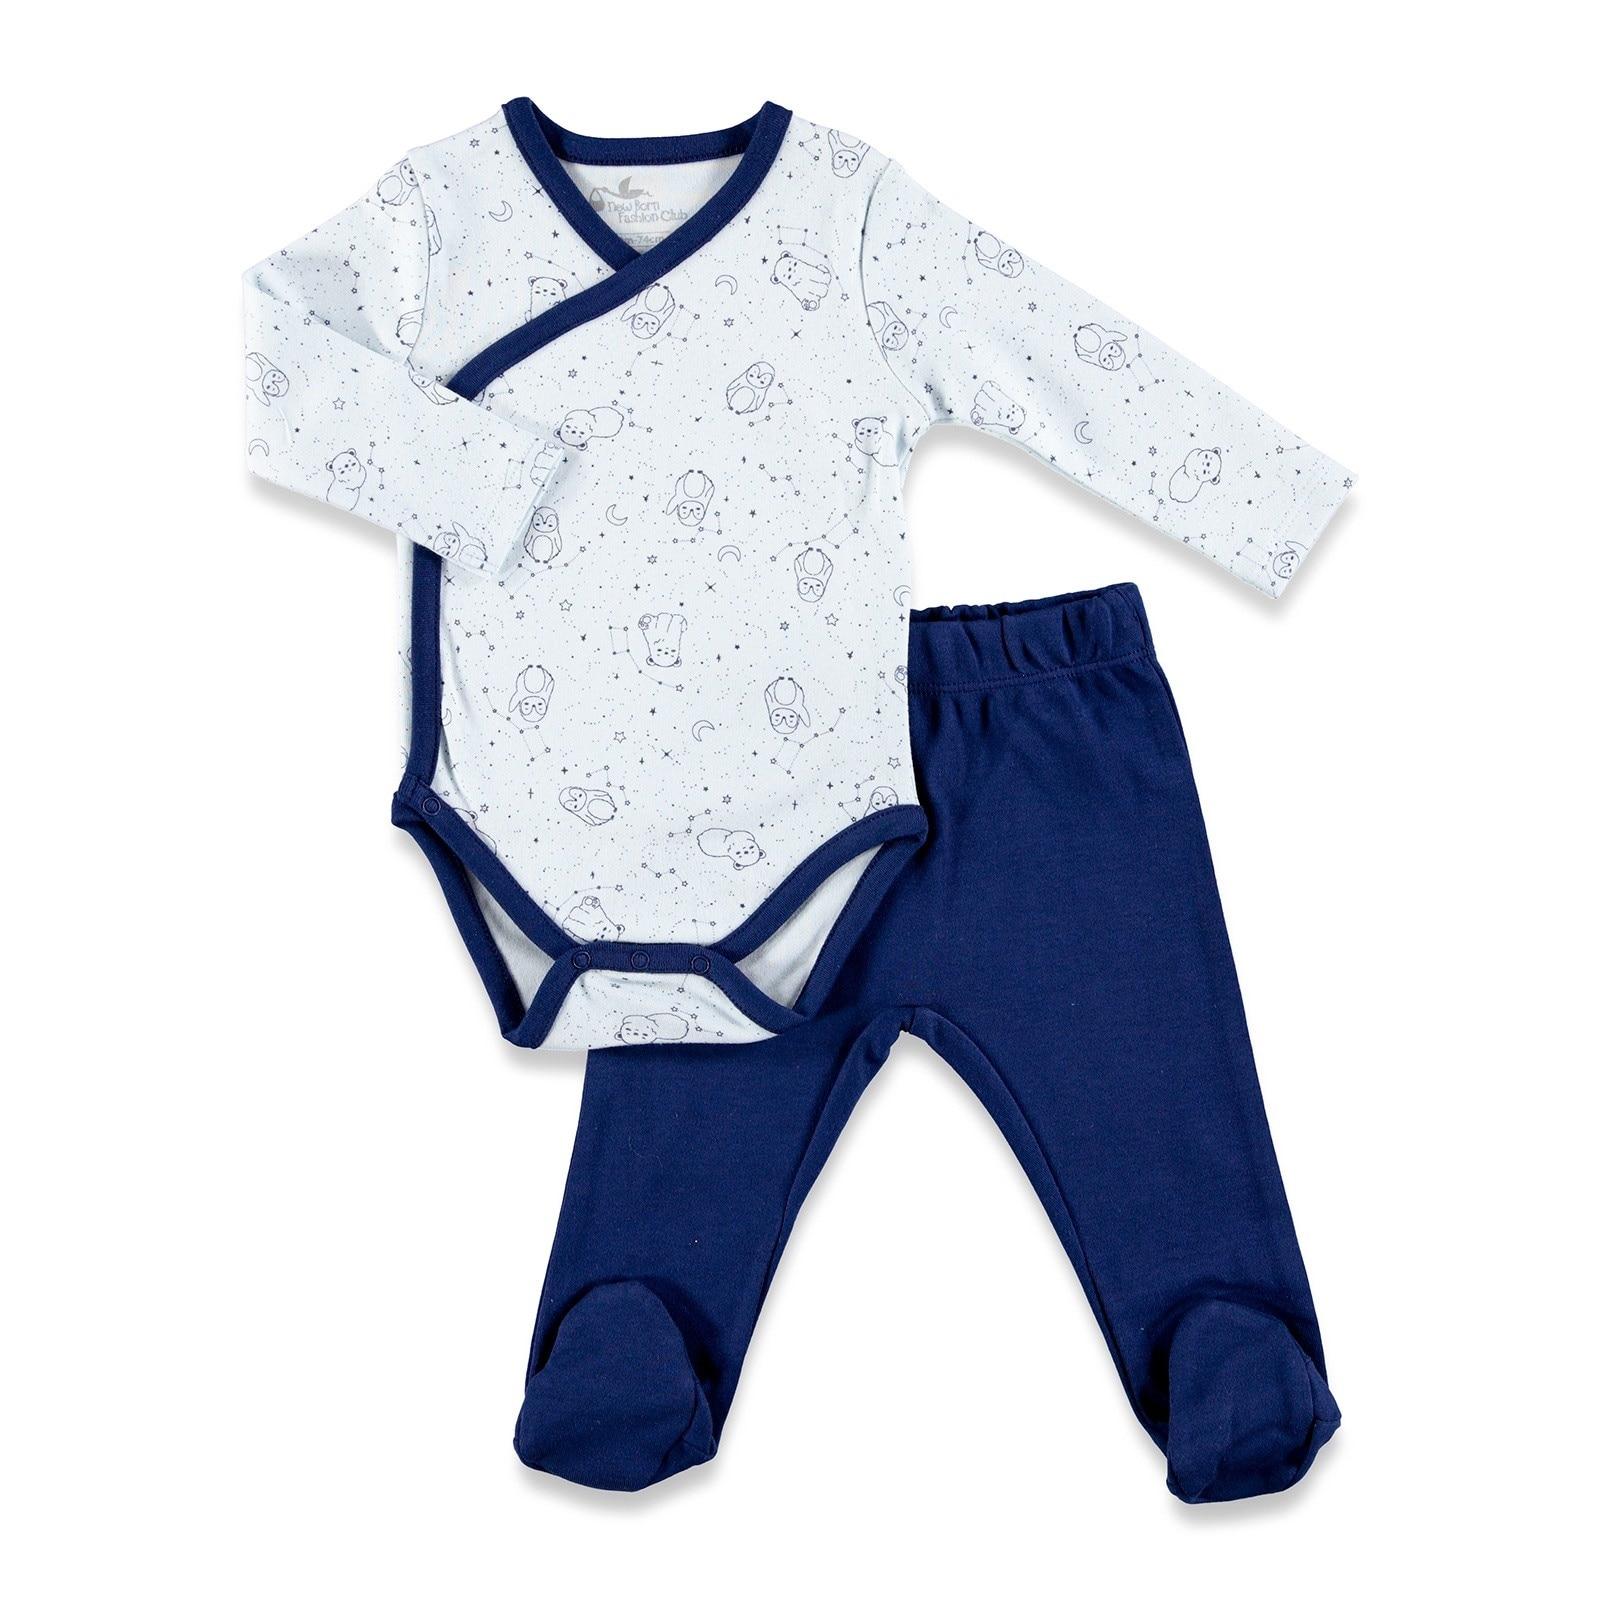 Ebebek Newborn Fashion Club Polar Adventure Baby Bodysuits Footless Pants